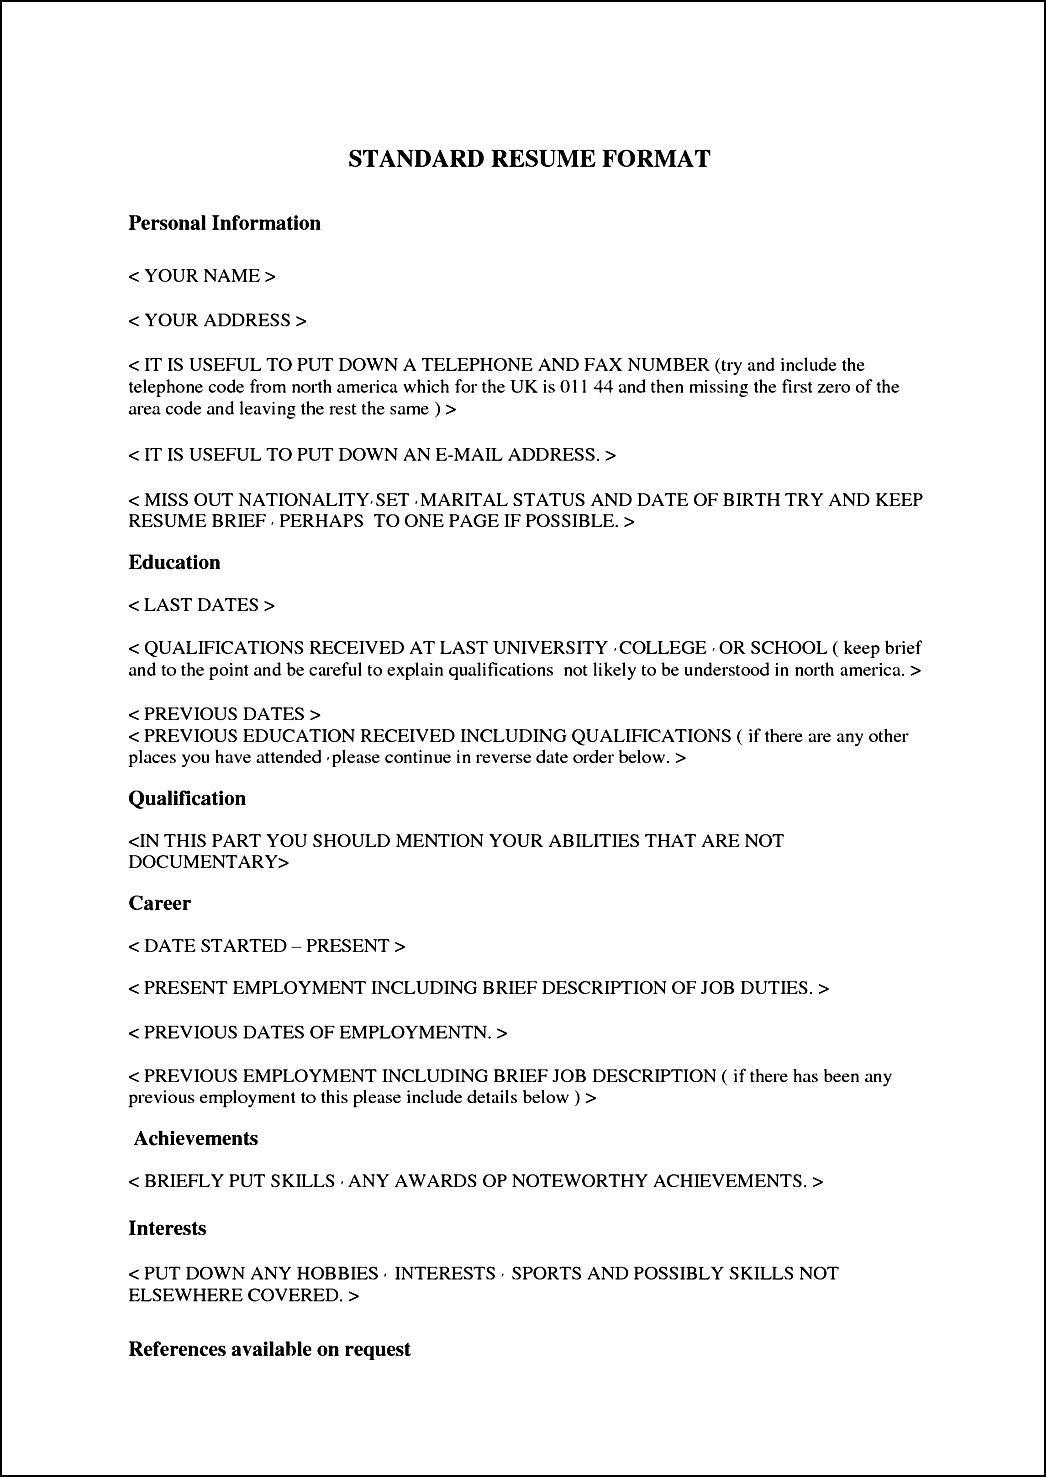 Standard Curriculum Vitae Format Free Samples Examples